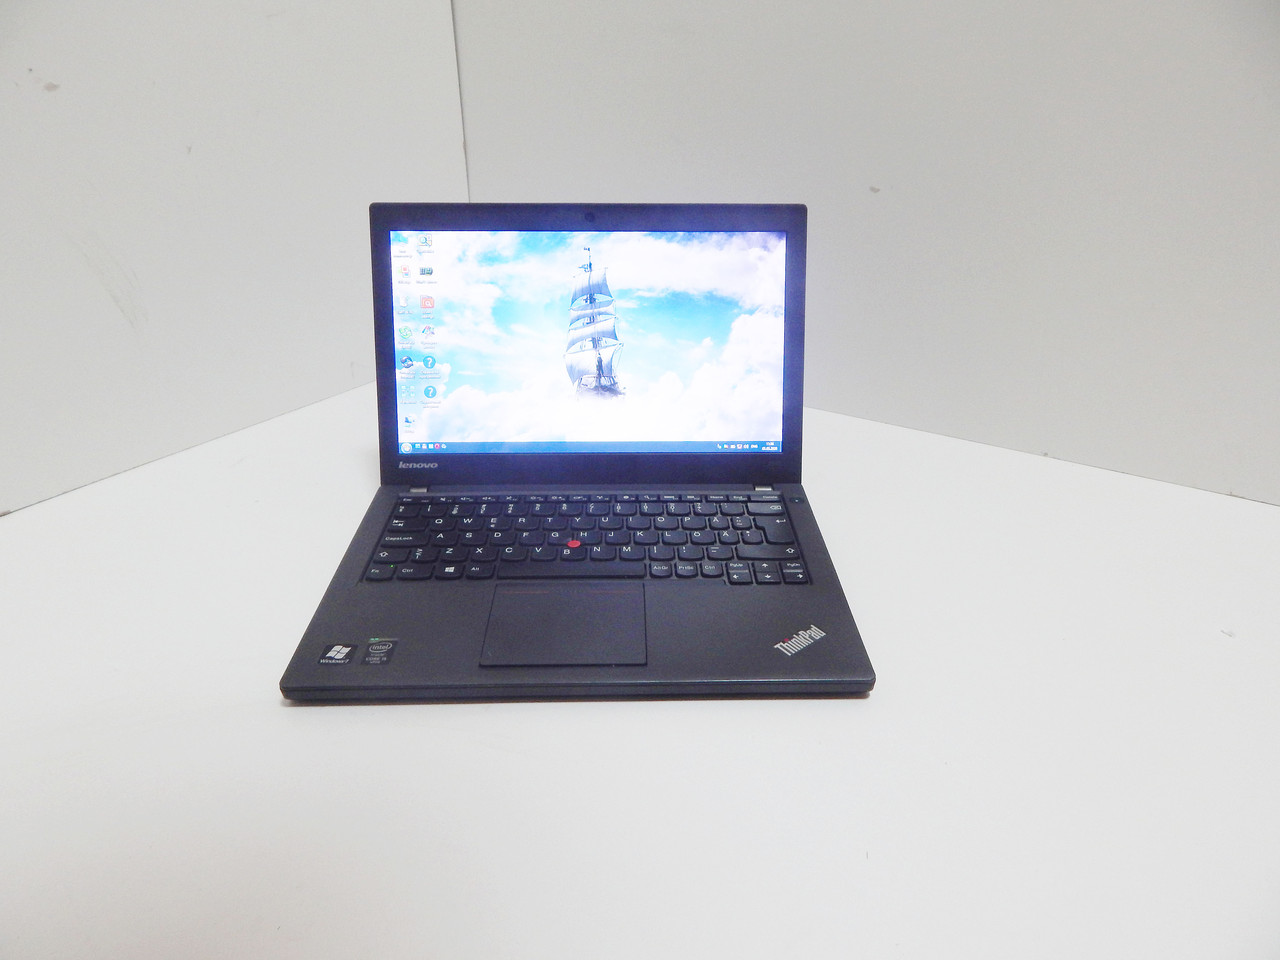 "Ноутбук Lenovo ThinkPad X240 12,5"" LED  i5-4200U 2,9 Ghz 12,5""/4/128 SSD/WEBCAM/1366x768 intel HD 4400"